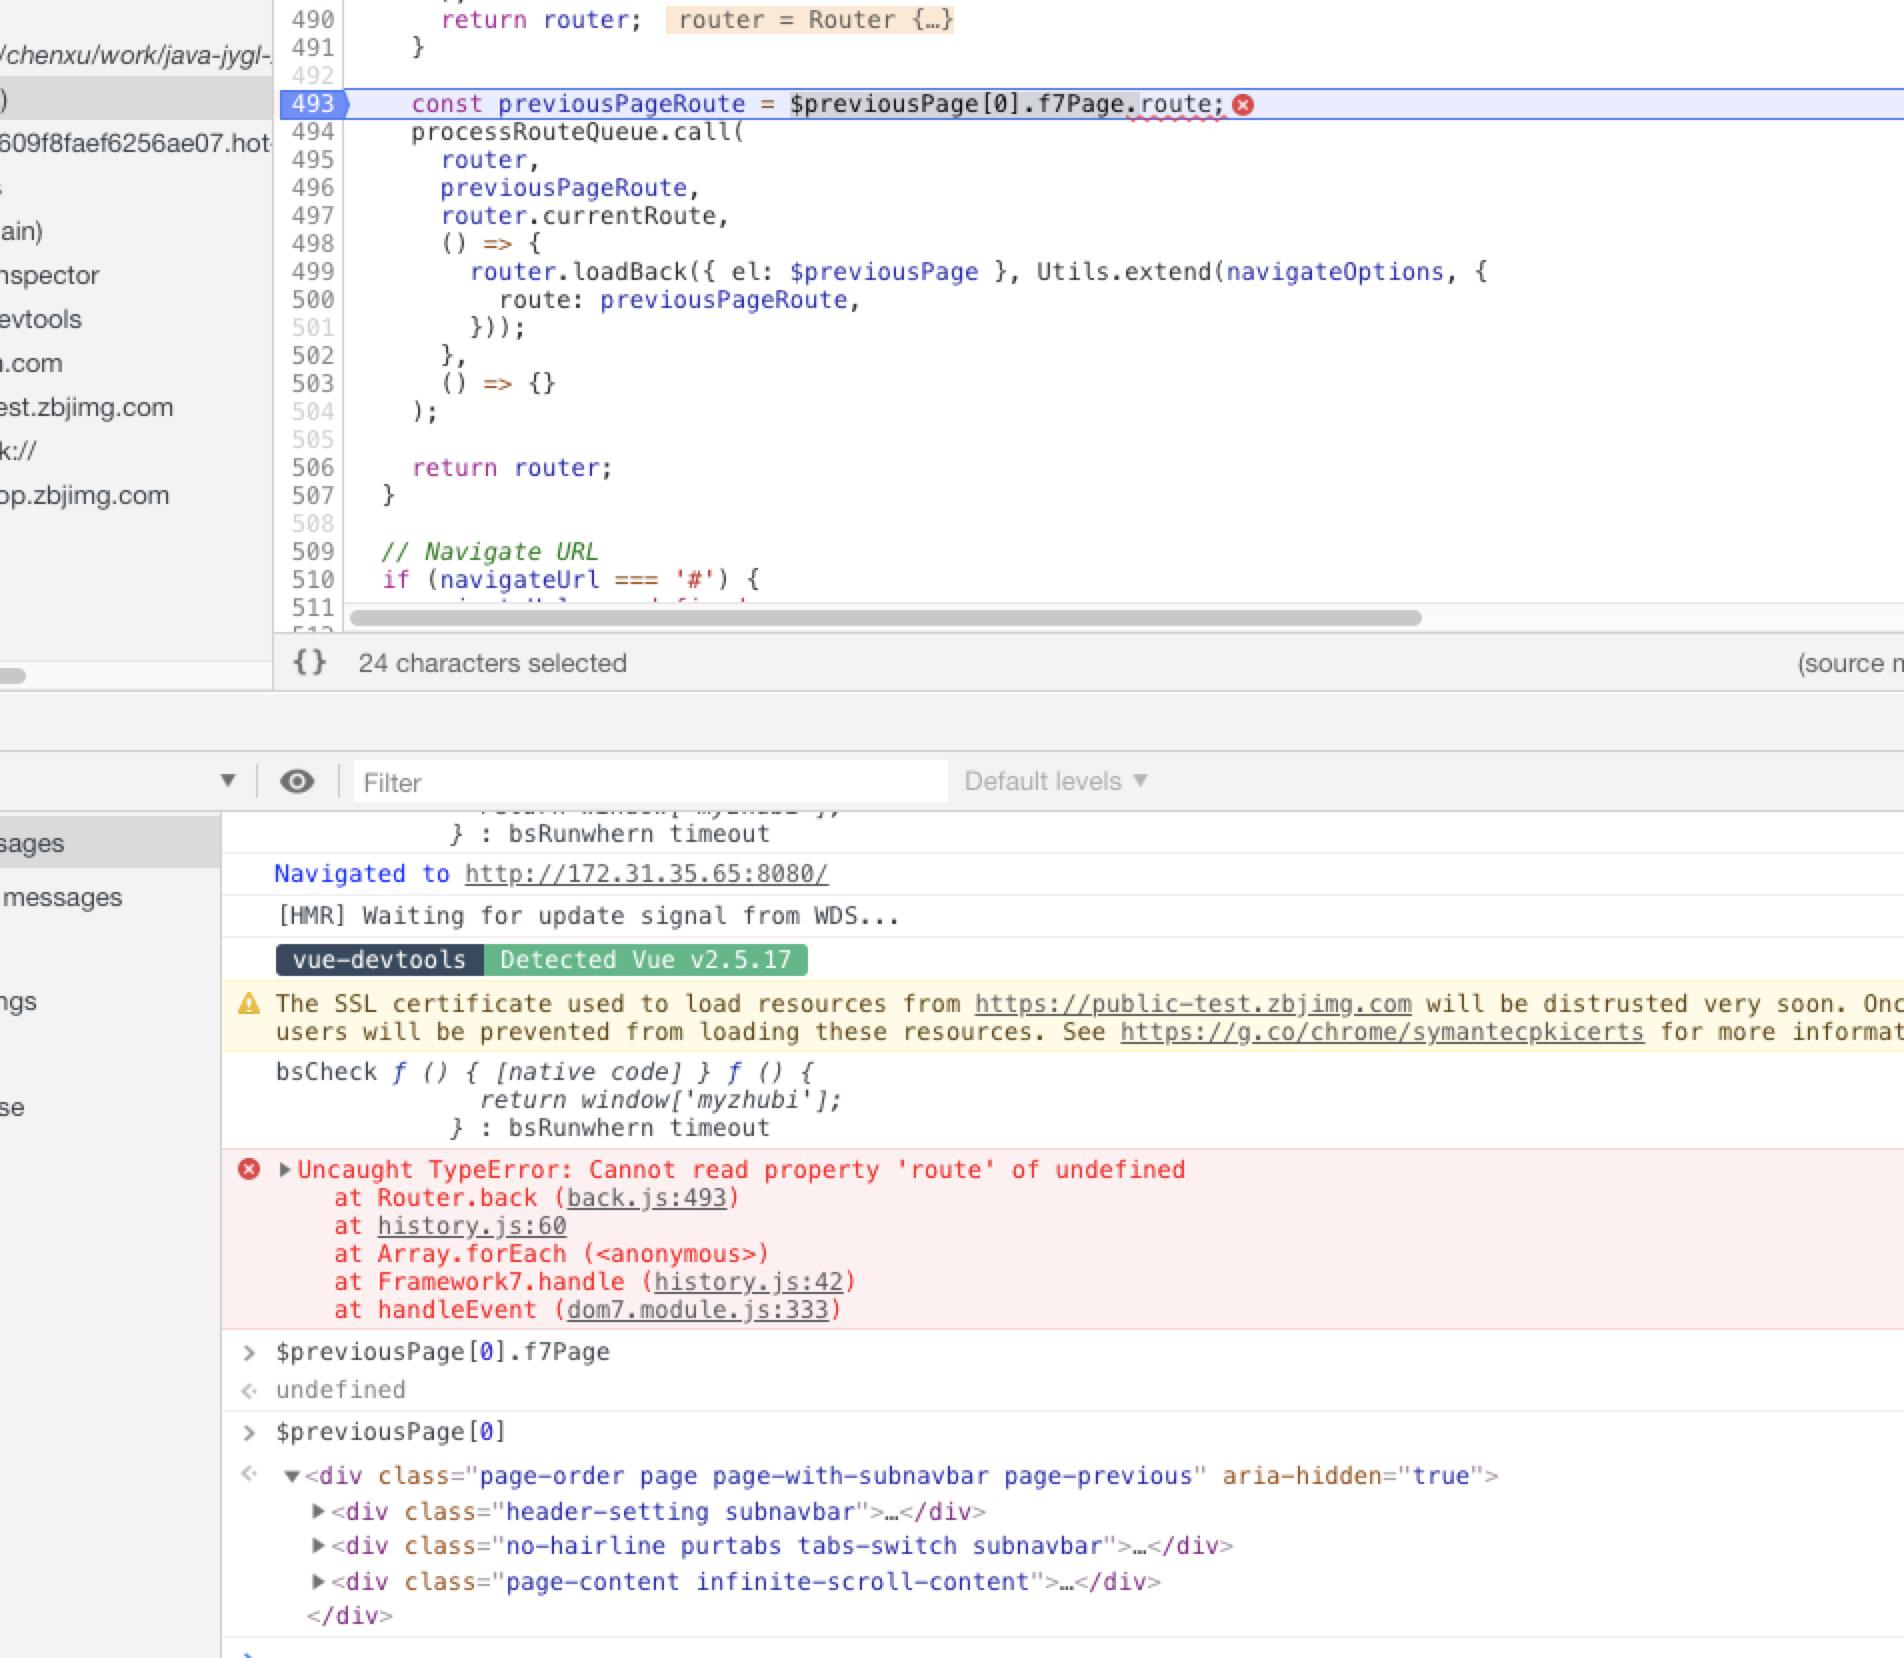 route back donot work · Issue #2868 · framework7io/framework7 · GitHub